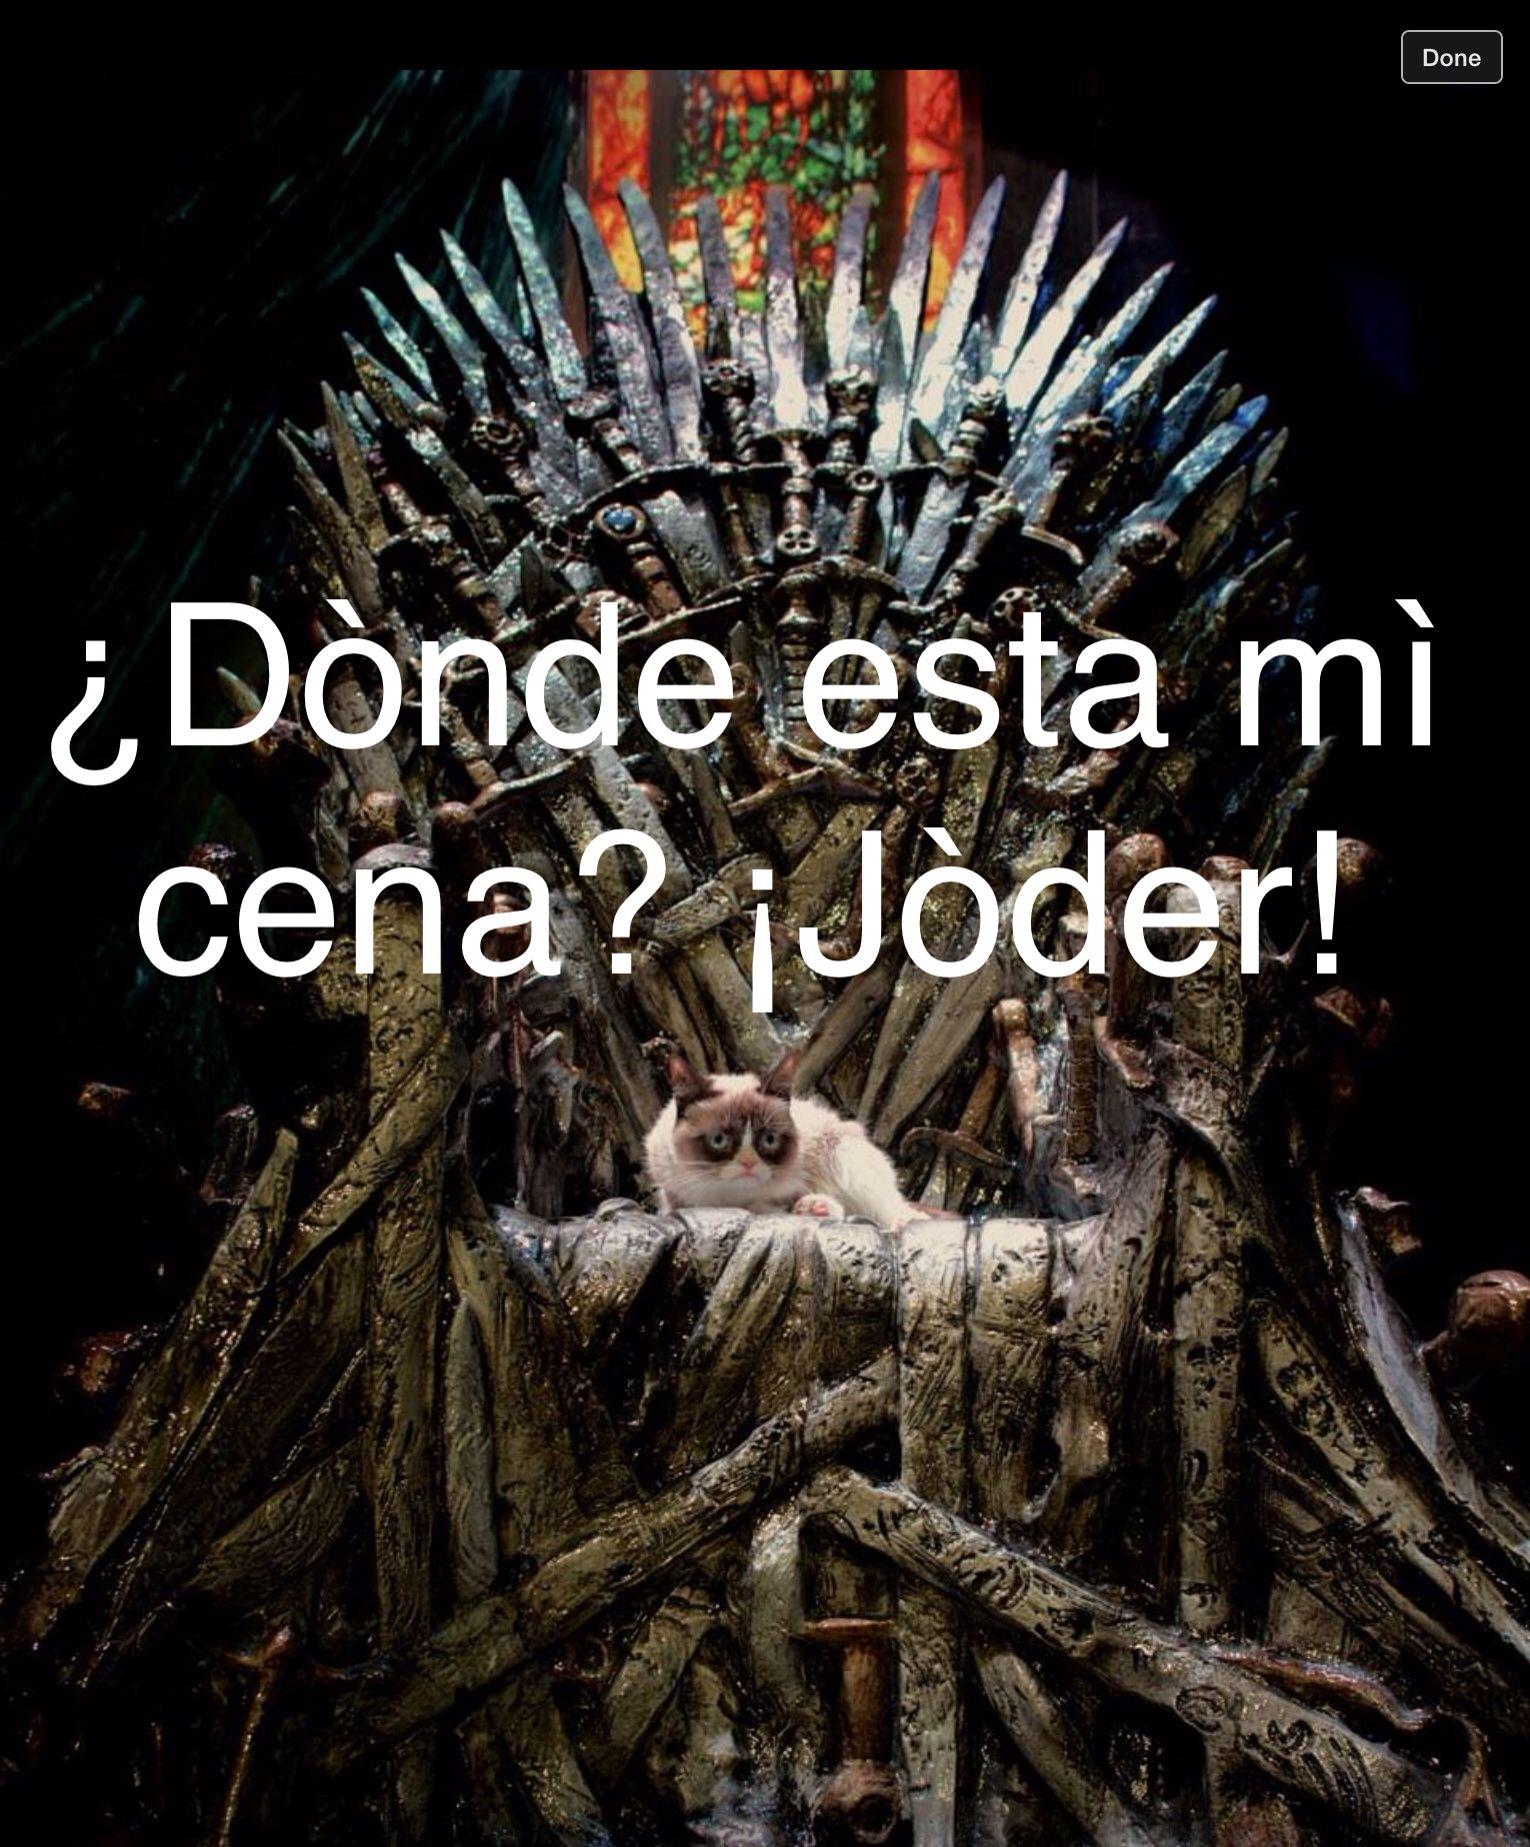 Grumpy Cat Meme In Spanish Translation Where Is My Dinner